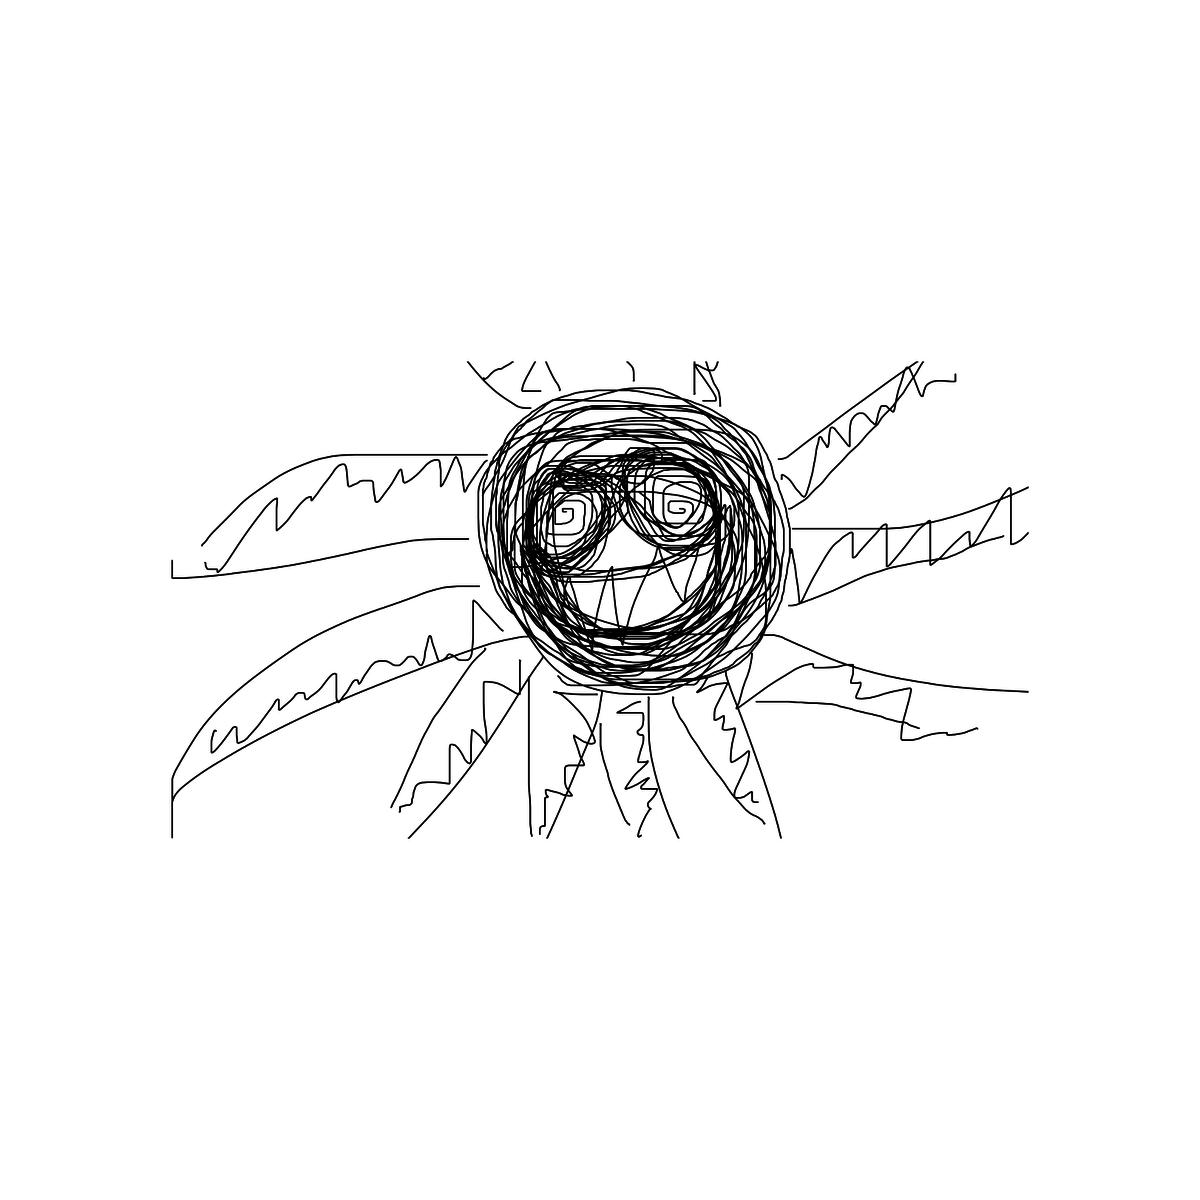 BAAAM drawing#3251 lat:24.5870838165283200lng: 121.4097747802734400